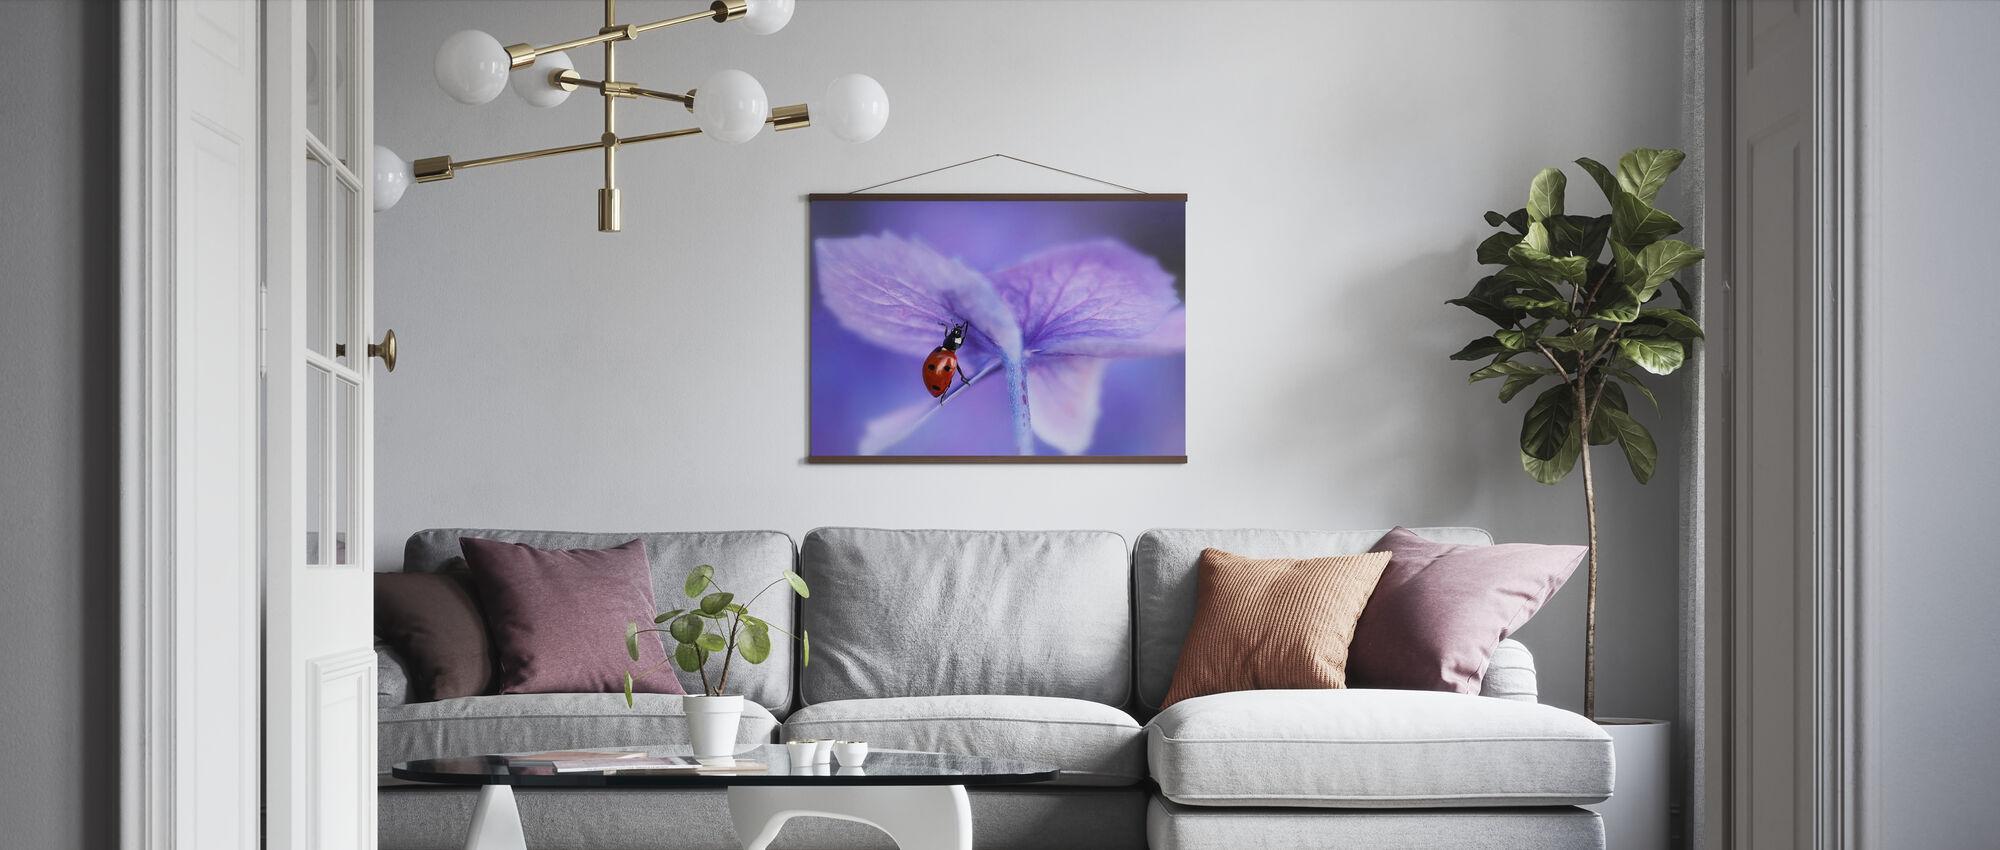 Leppäkerttu Purppura hortensia - Juliste - Olohuone